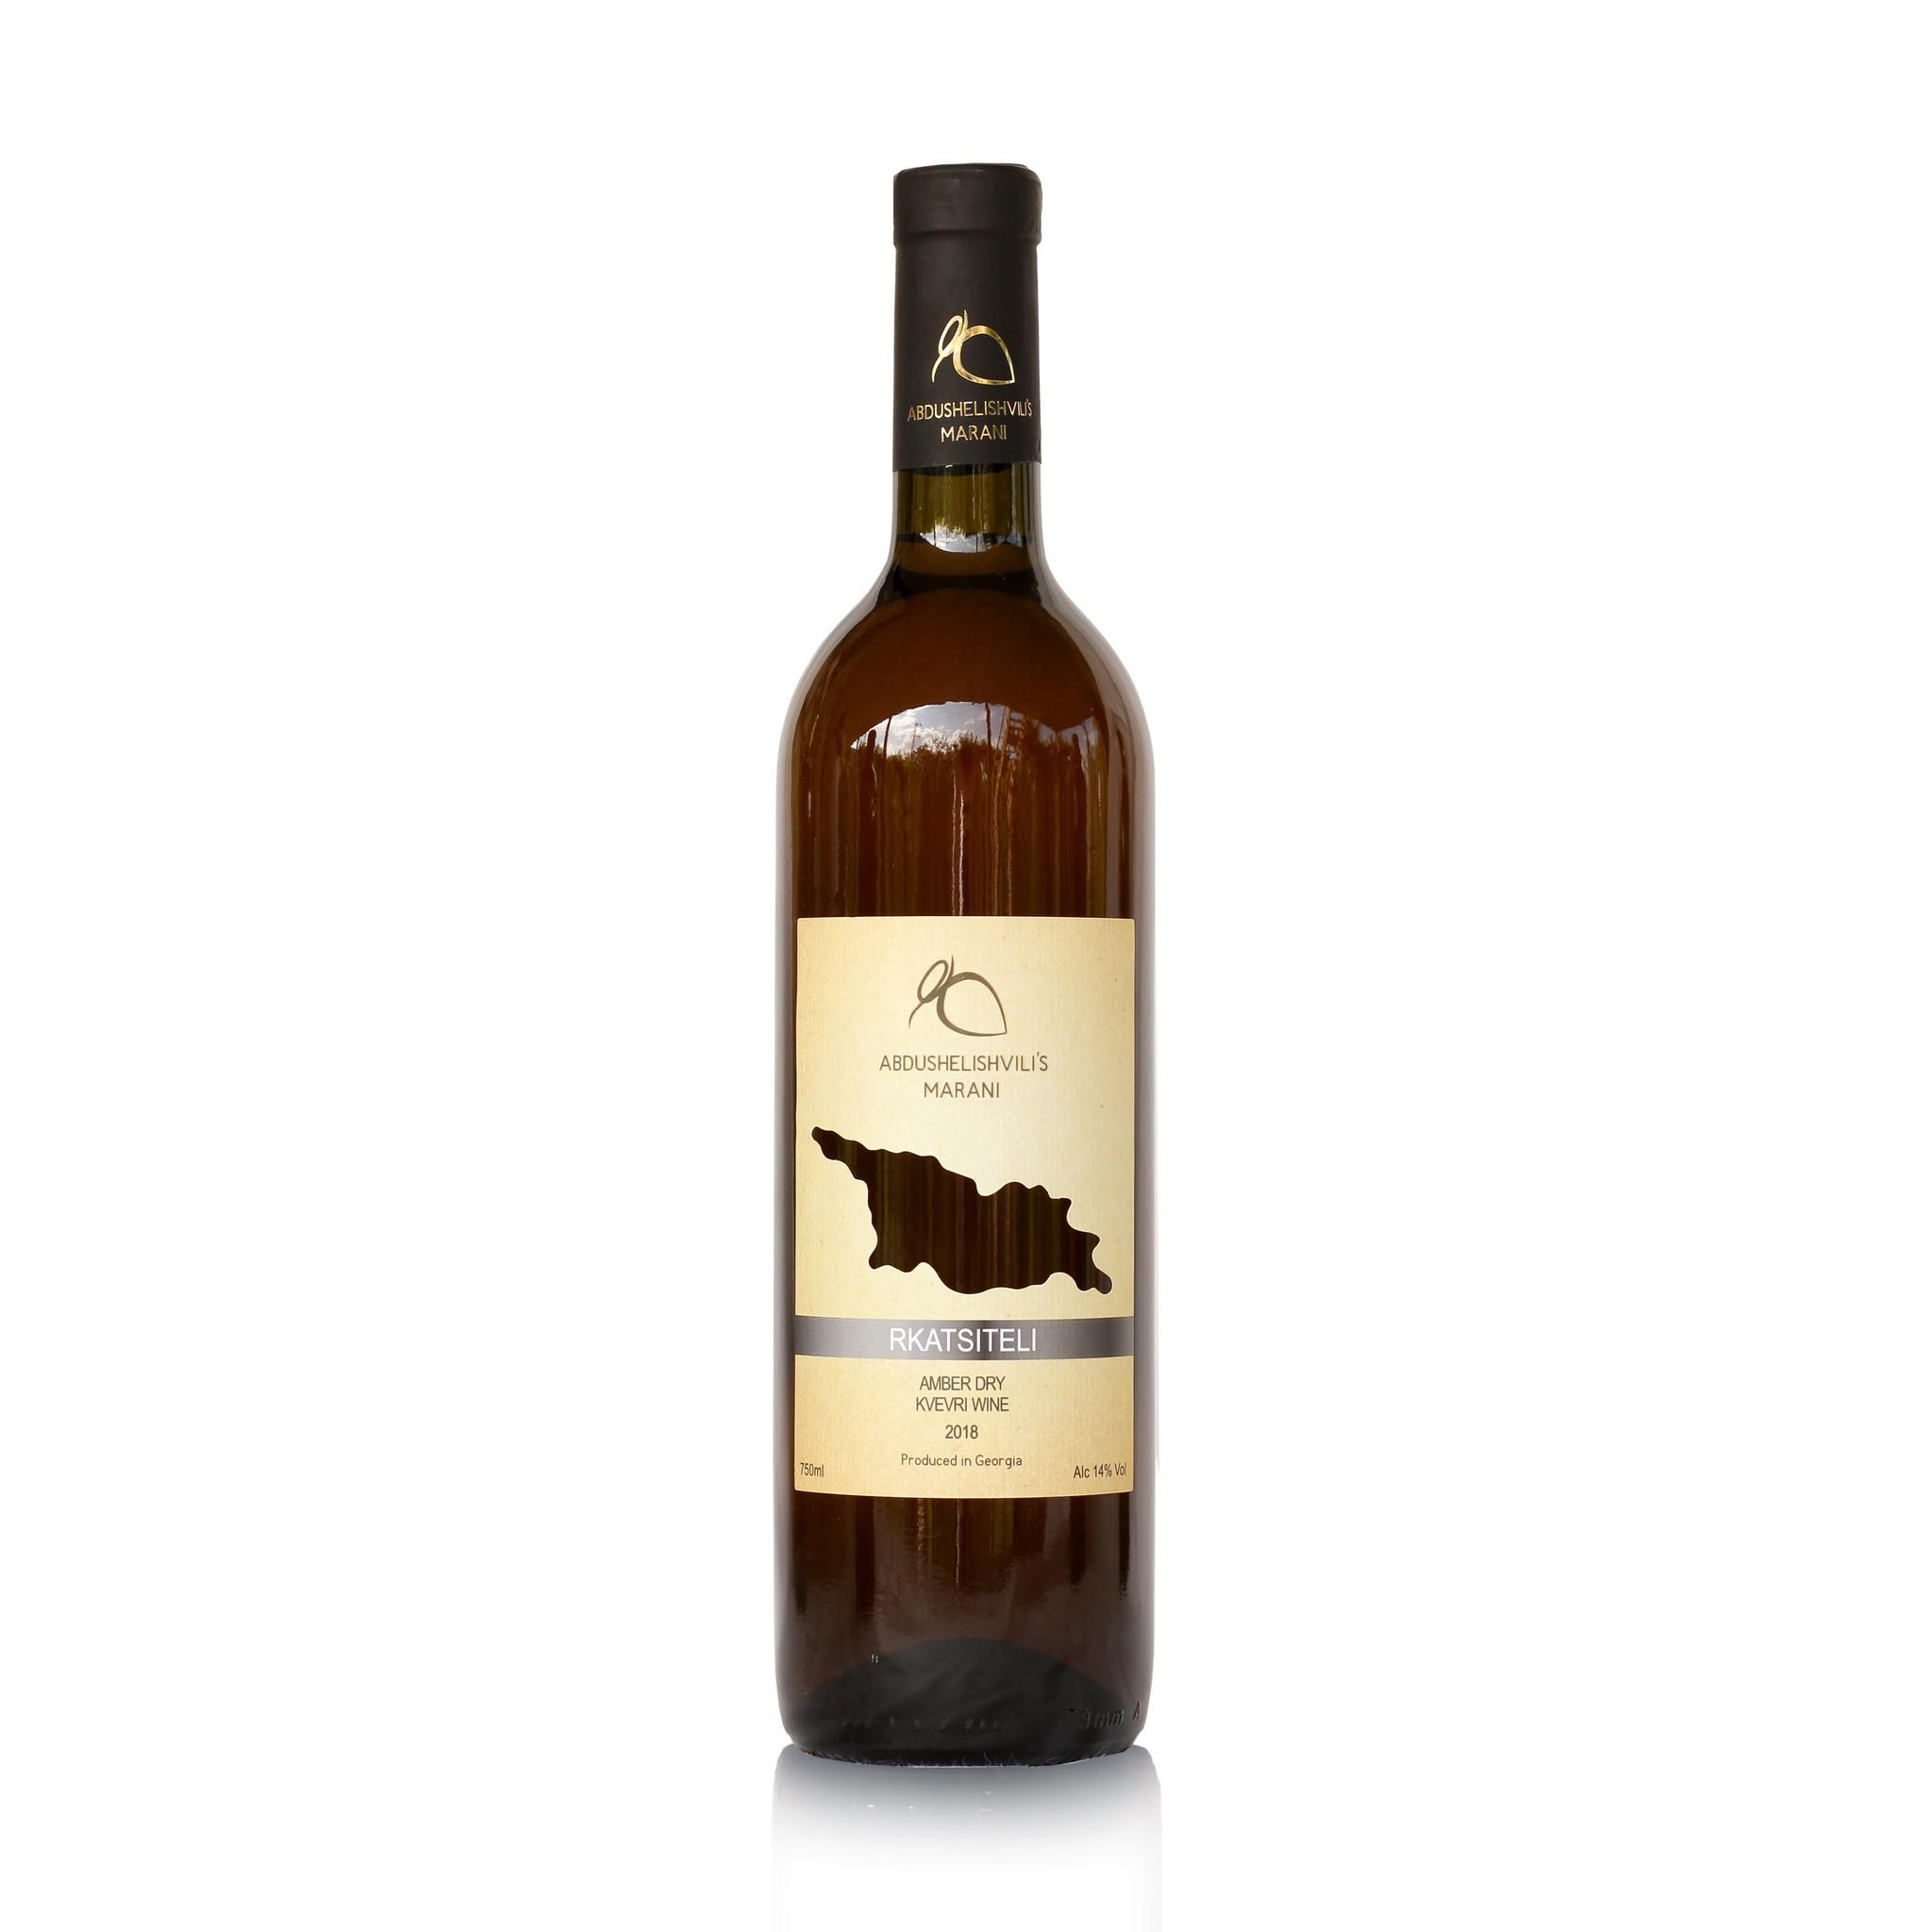 Abdushelishvili Winery Rkatsiteli Qvevri, Amber dry wine 2019, Abdushelishvili